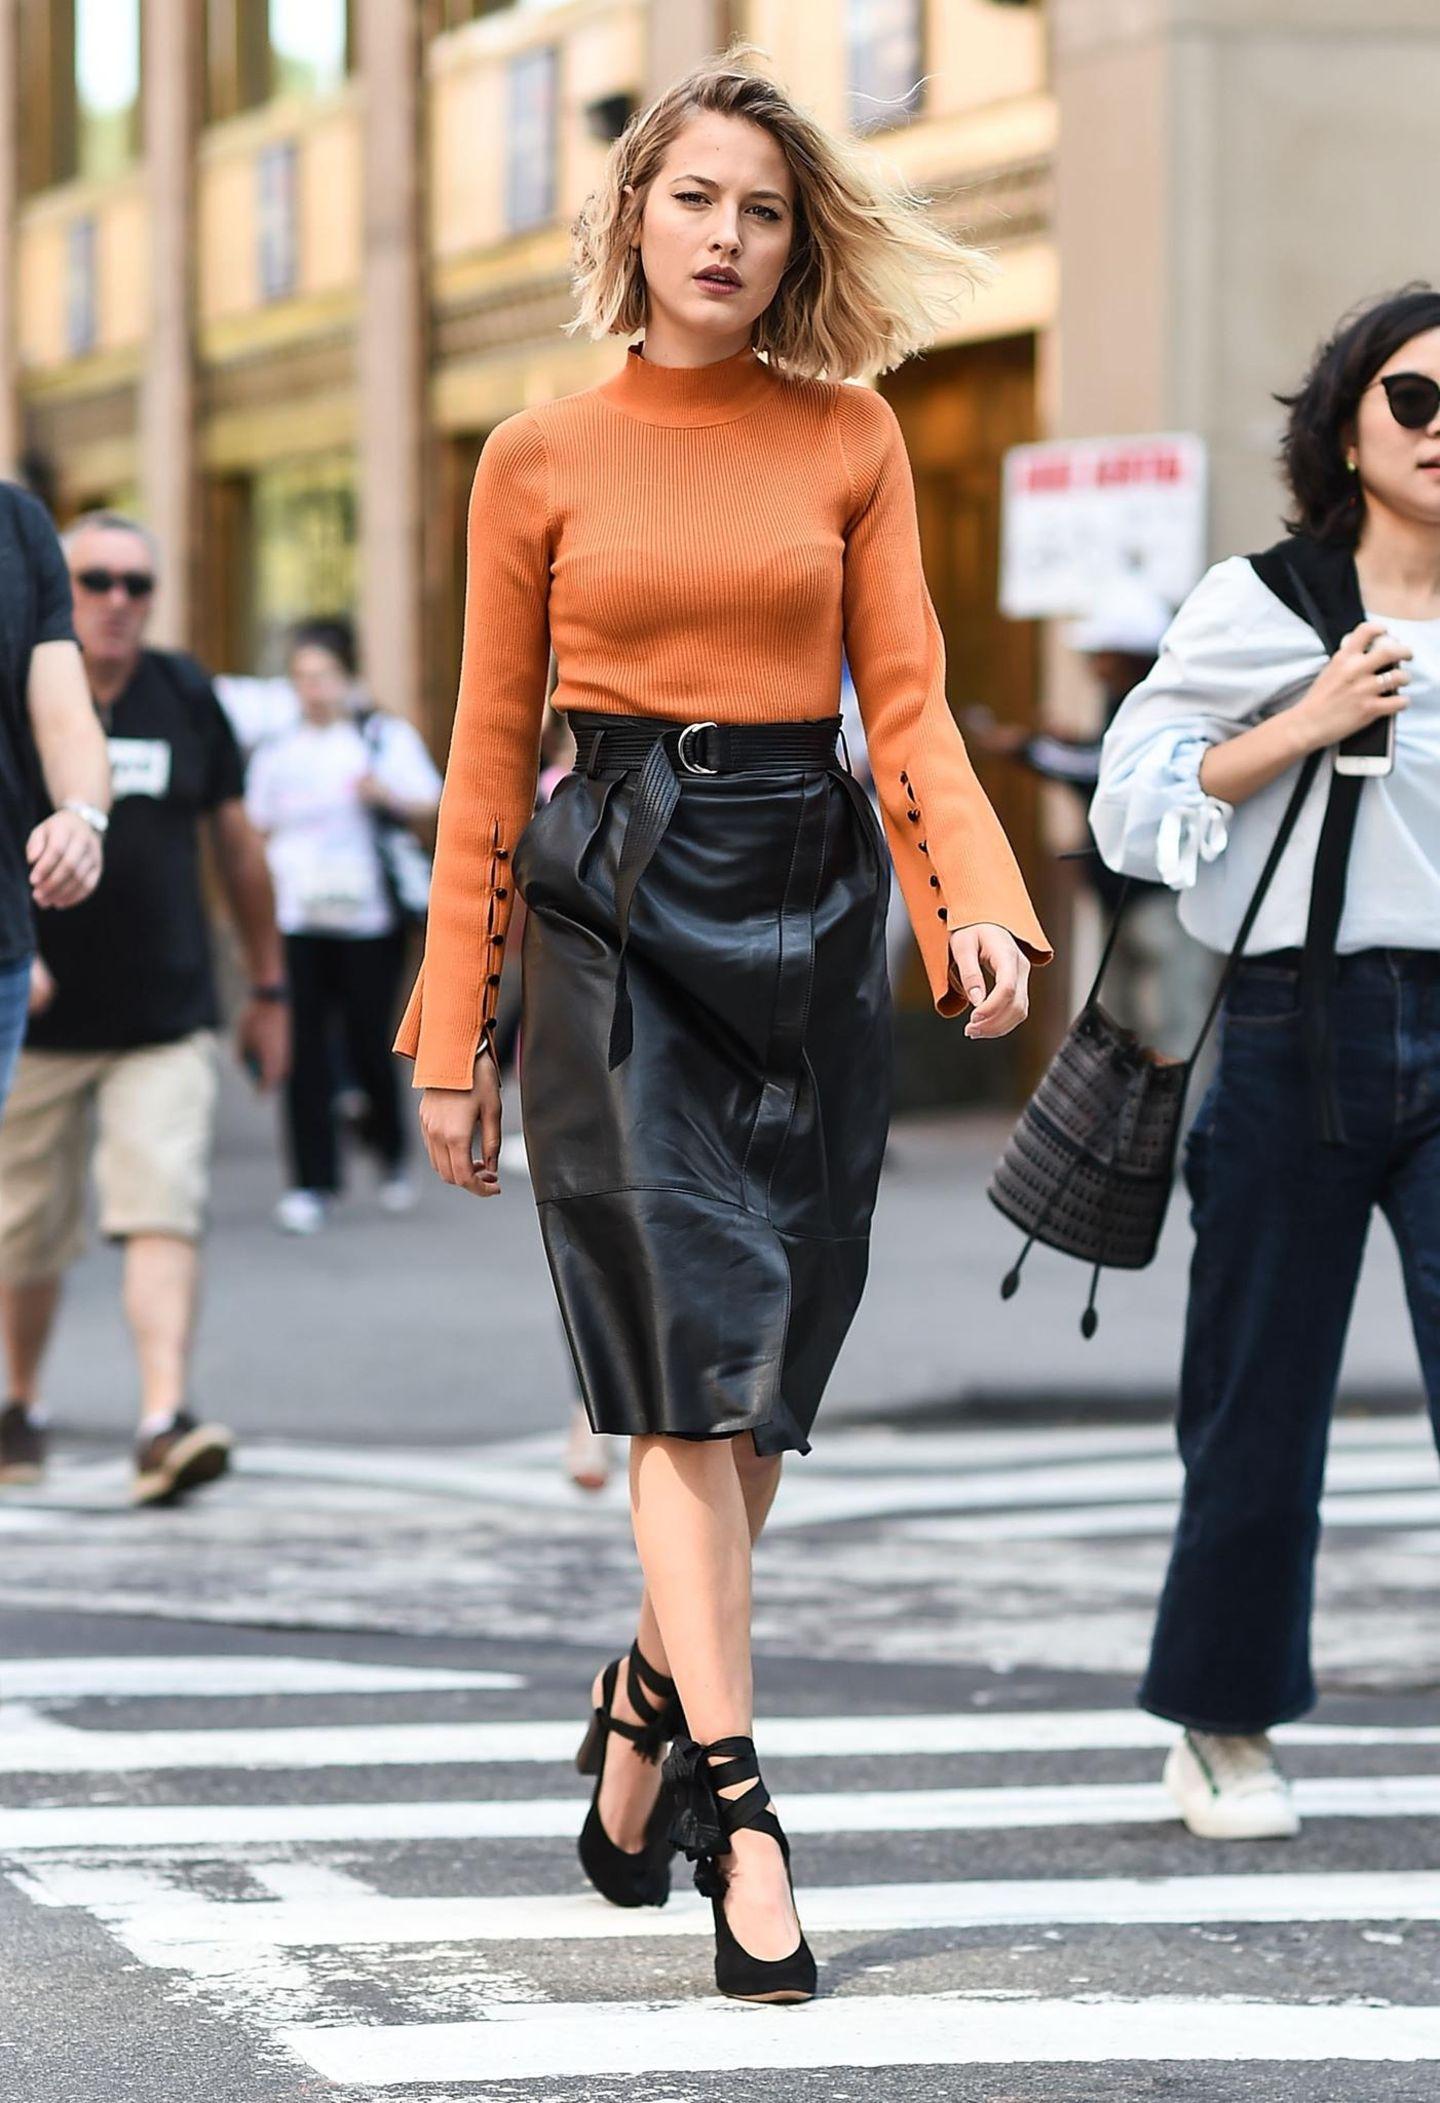 Streetstyle mit schwarzem Lederrock und orangenem Pulli